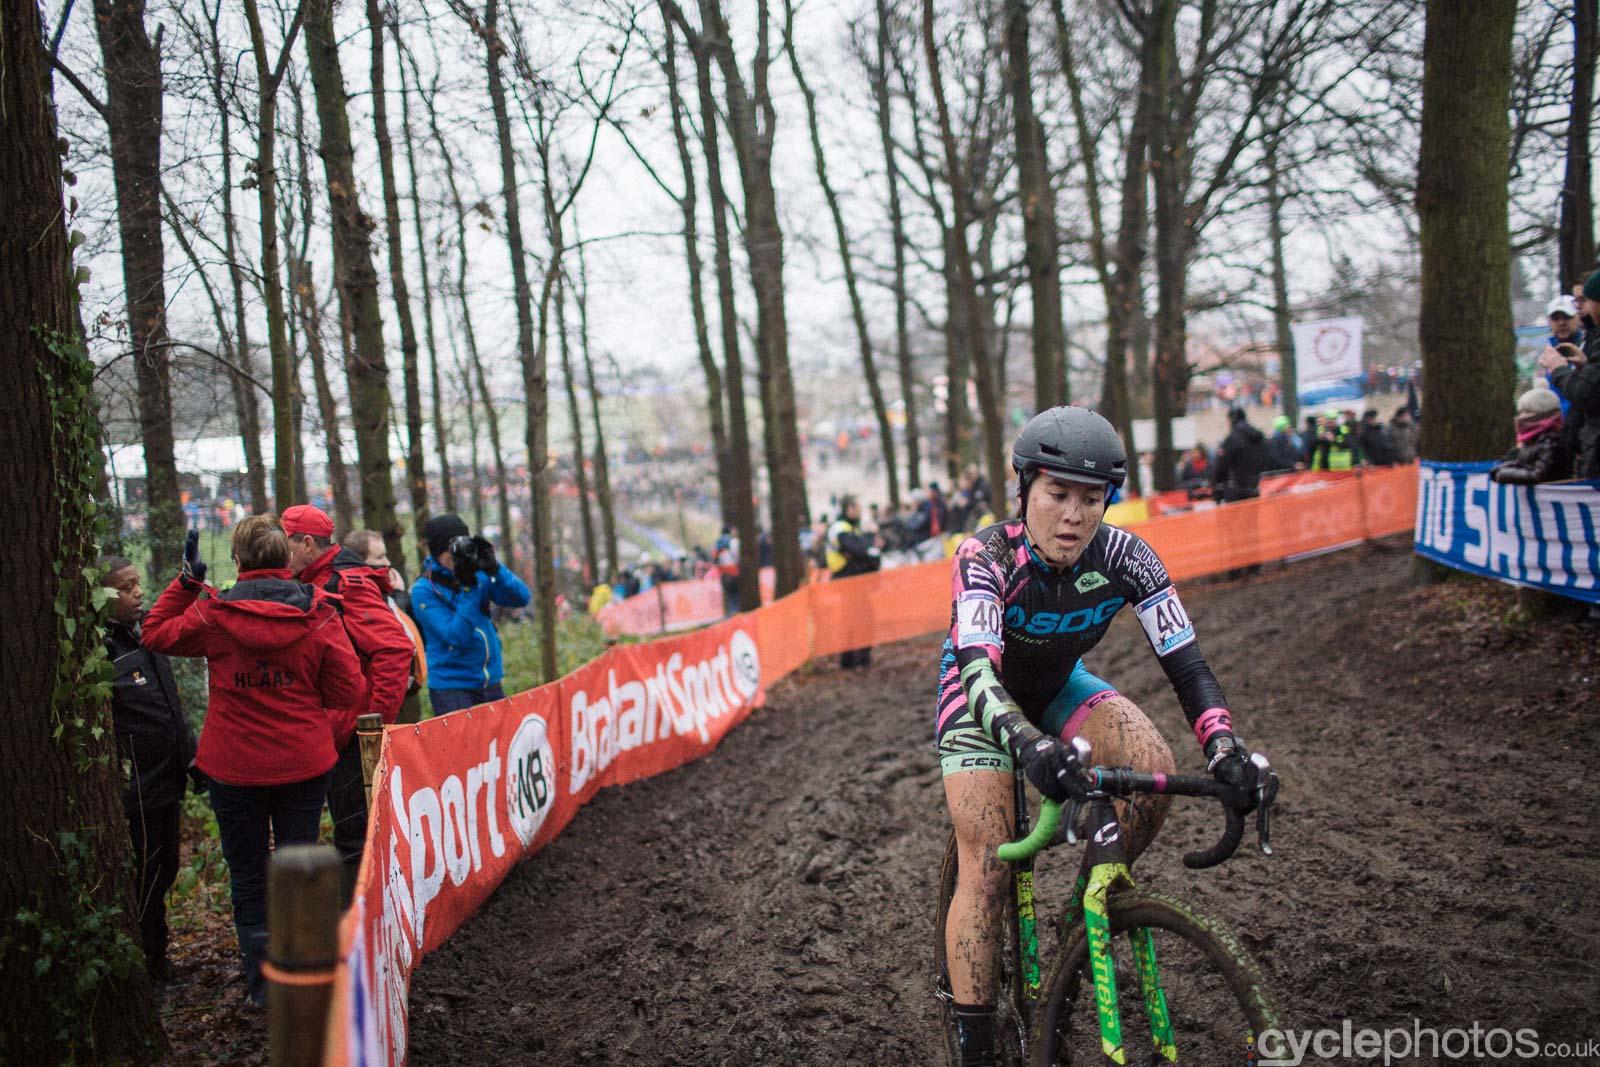 2016-cyclephotos-cyclocross-hoogerheide-135713-amanda-nauman